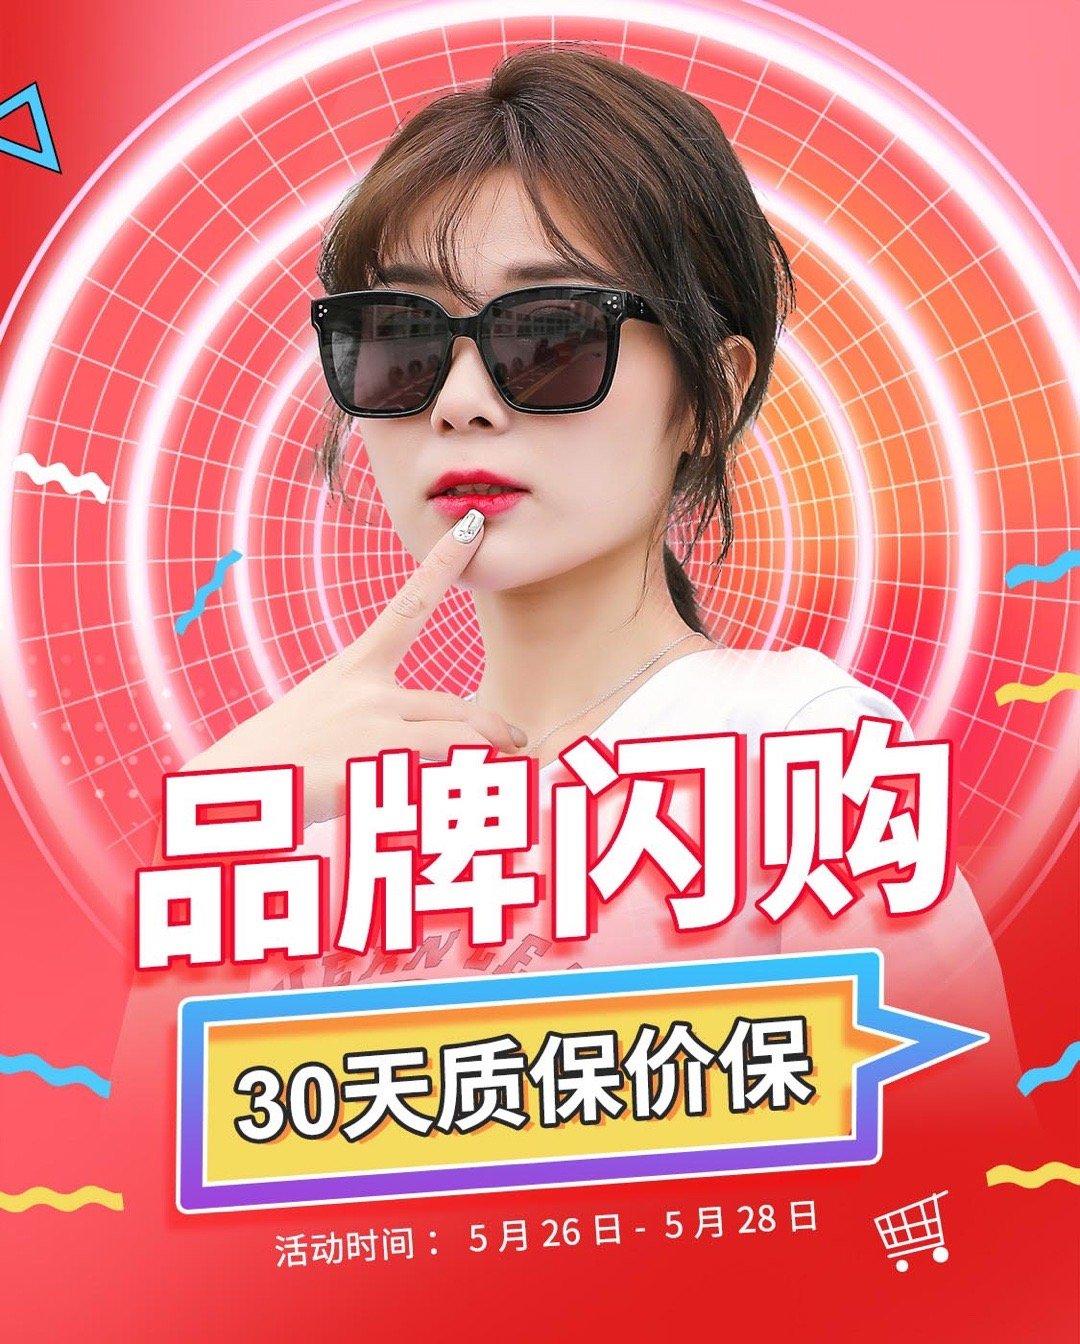 healbud产品提前购活动仅三天部分太阳镜上海北京广州3仓就近发货急